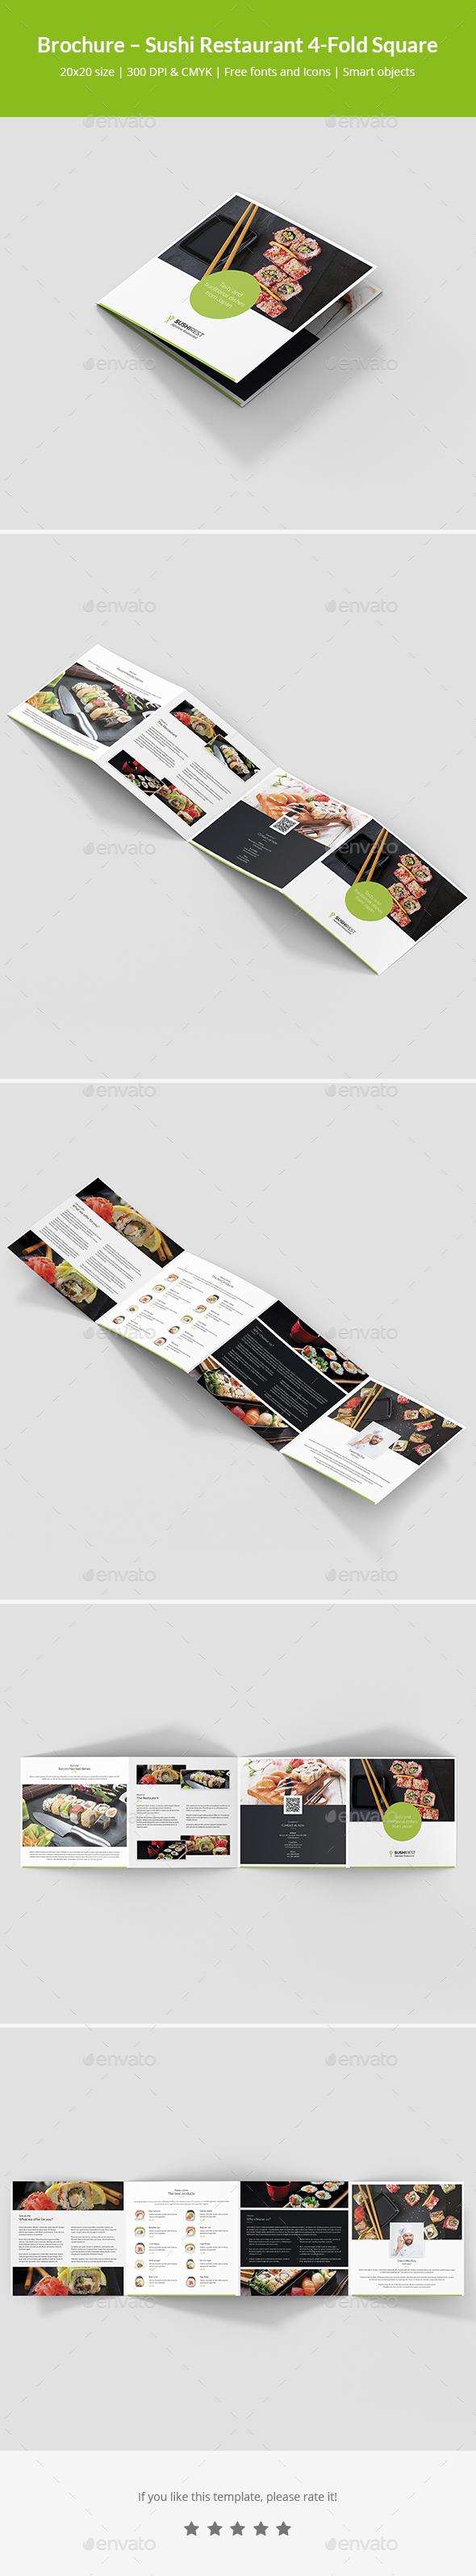 Brochure – Sushi Restaurant 4-Fold Square - Informational Brochures